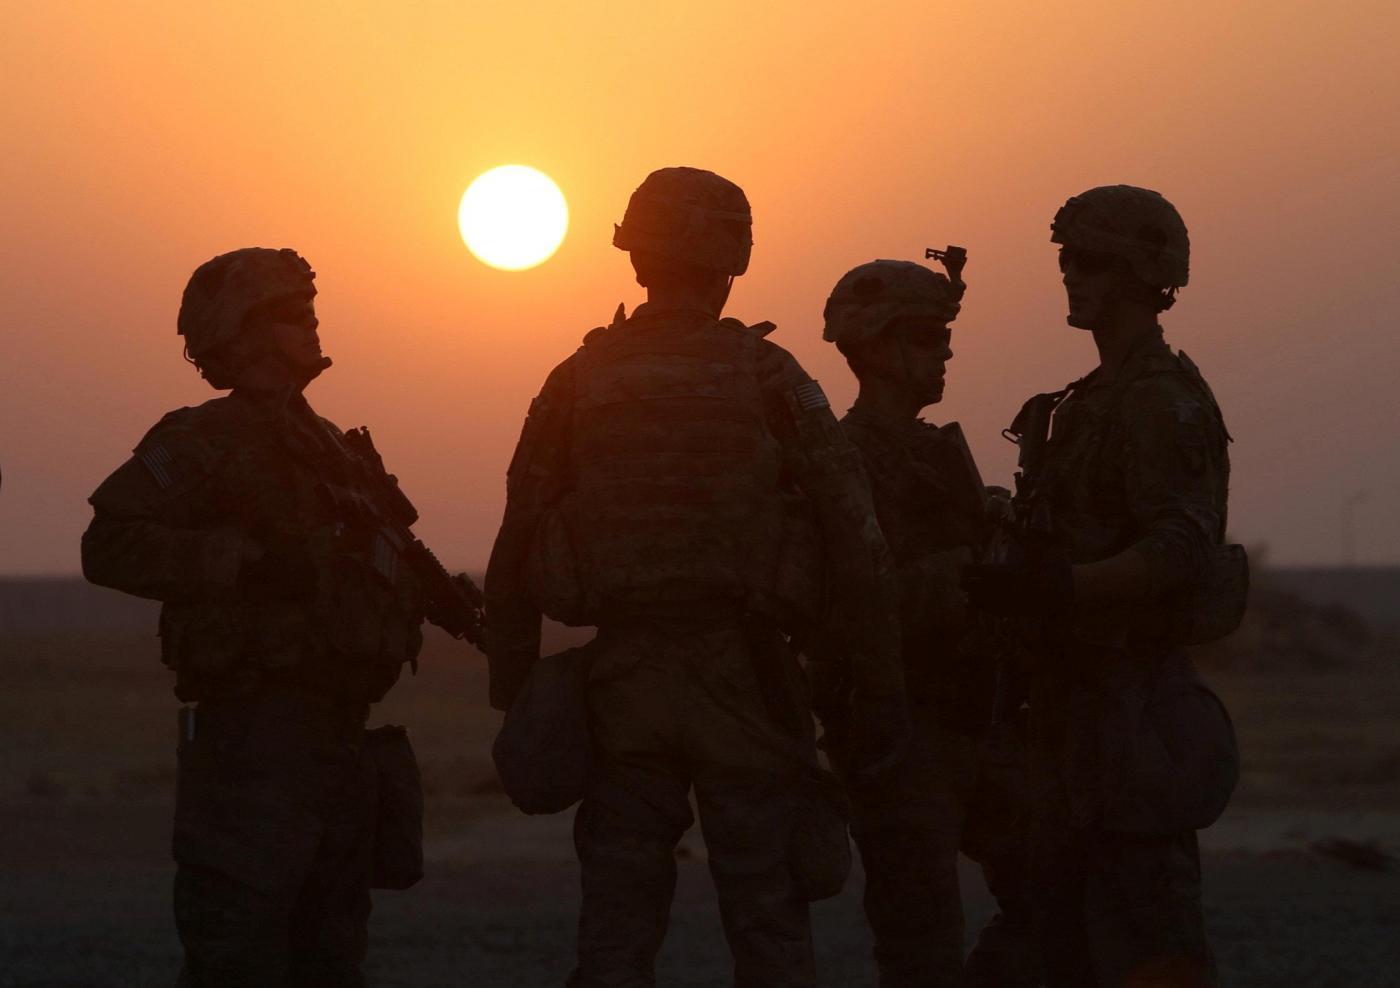 Guerra all'Isis, cosa sta succedendo a Mosul